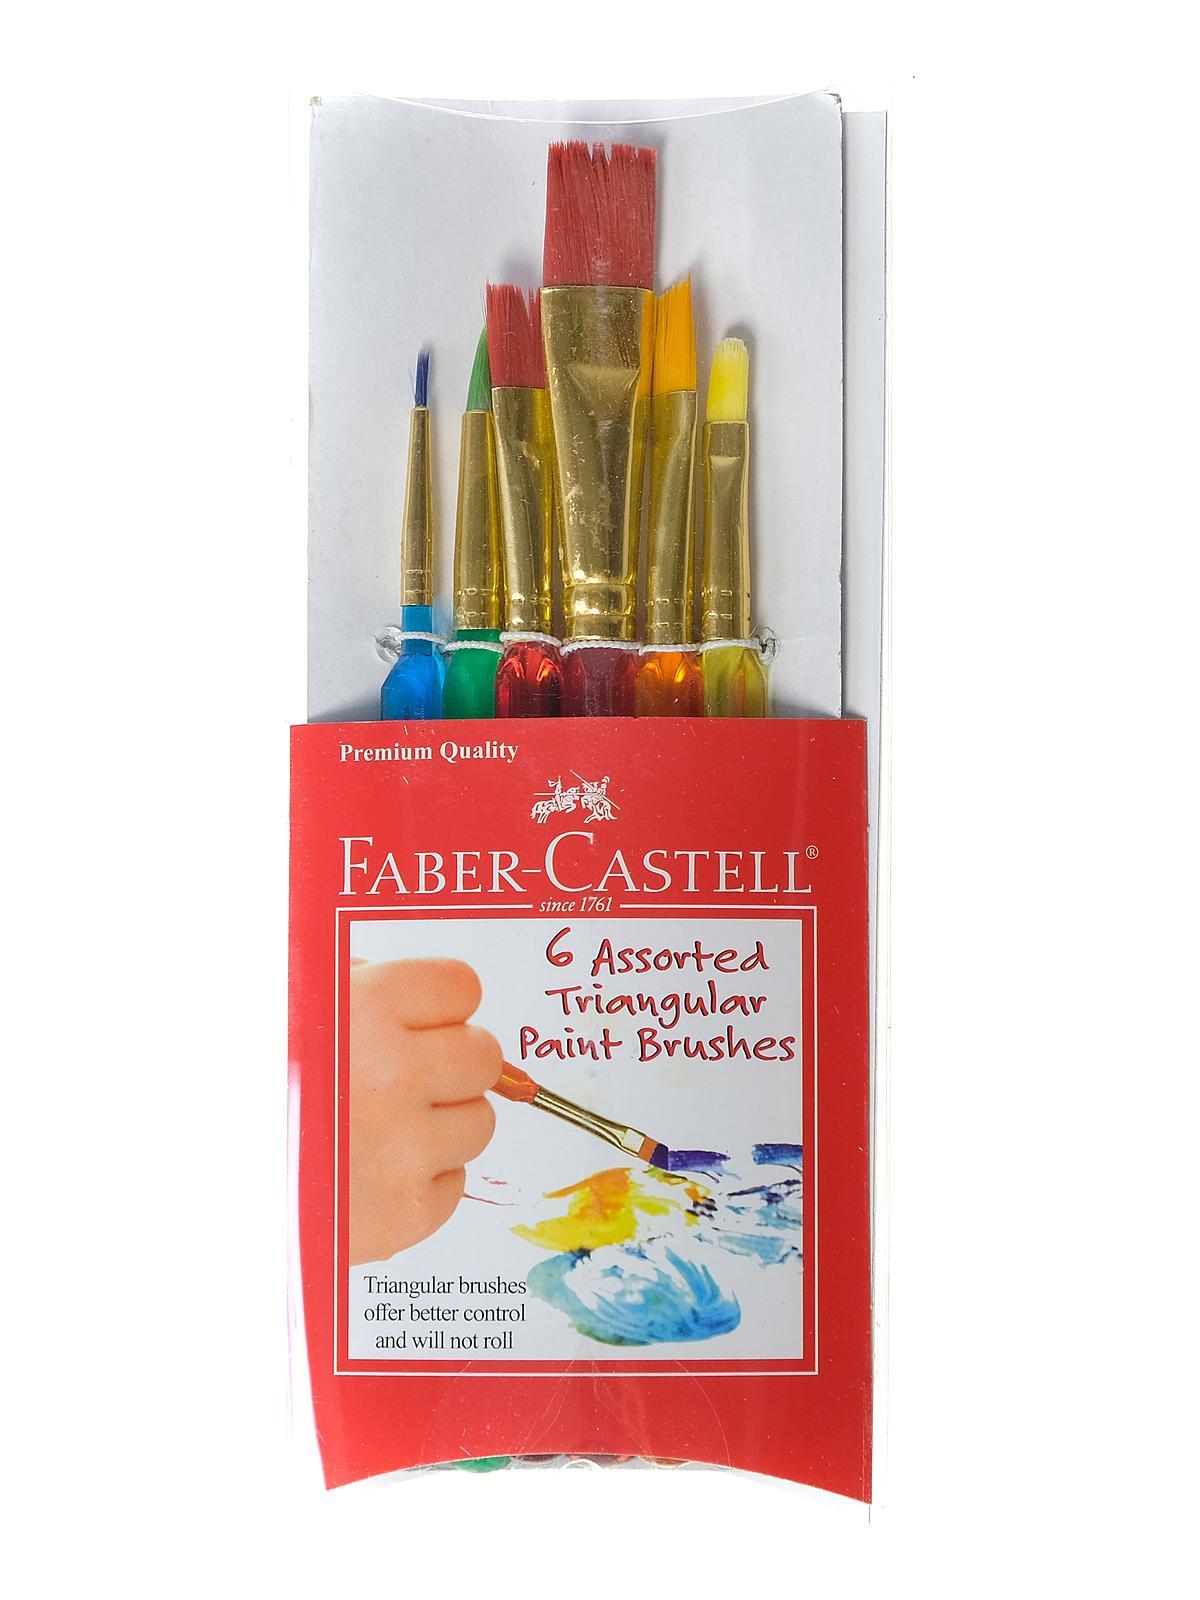 Assorted Triangular Paint Brushes